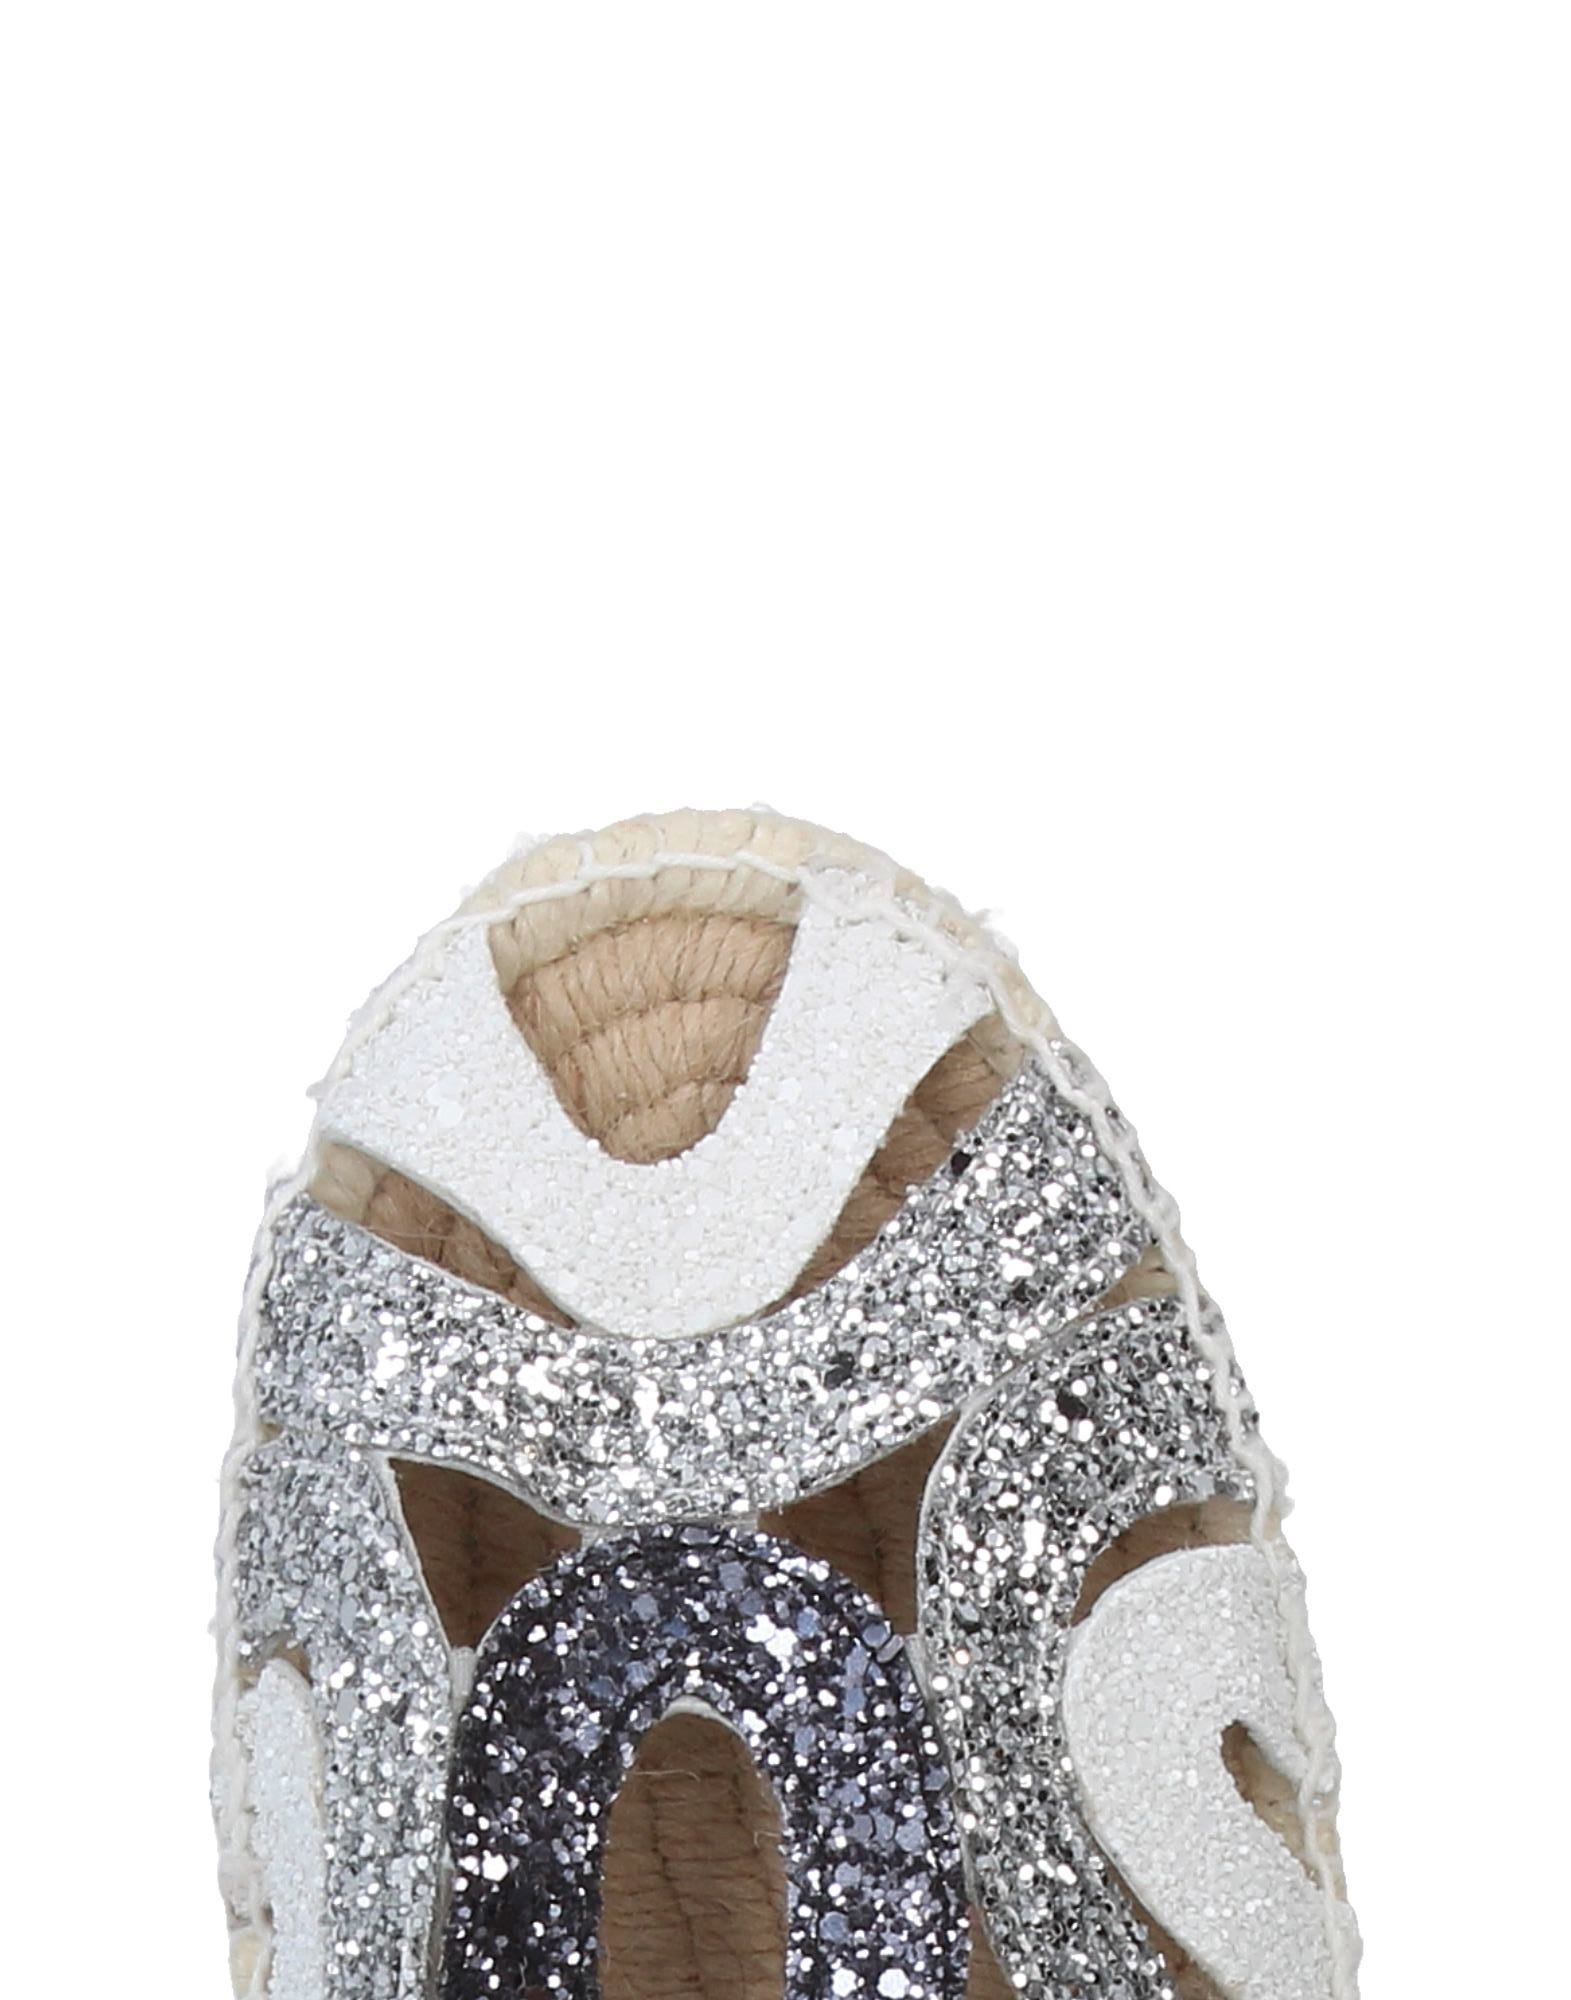 Lagoa Espadrilles Damen  11382501BL 11382501BL  Gute Qualität beliebte Schuhe f358c5